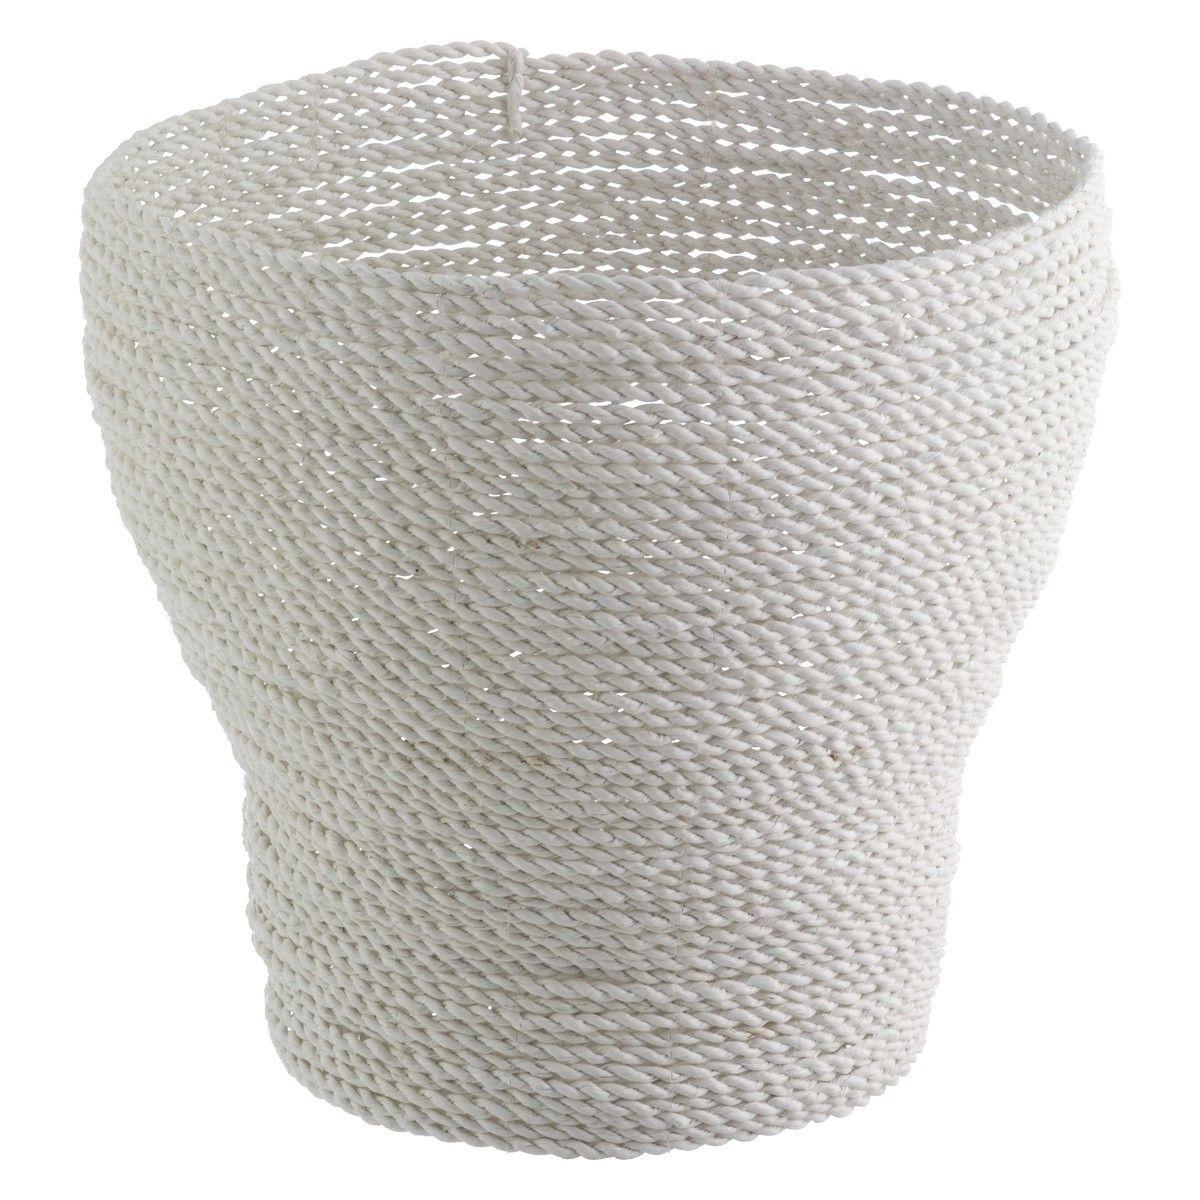 MORELL White Woven Plastic Storage Basket